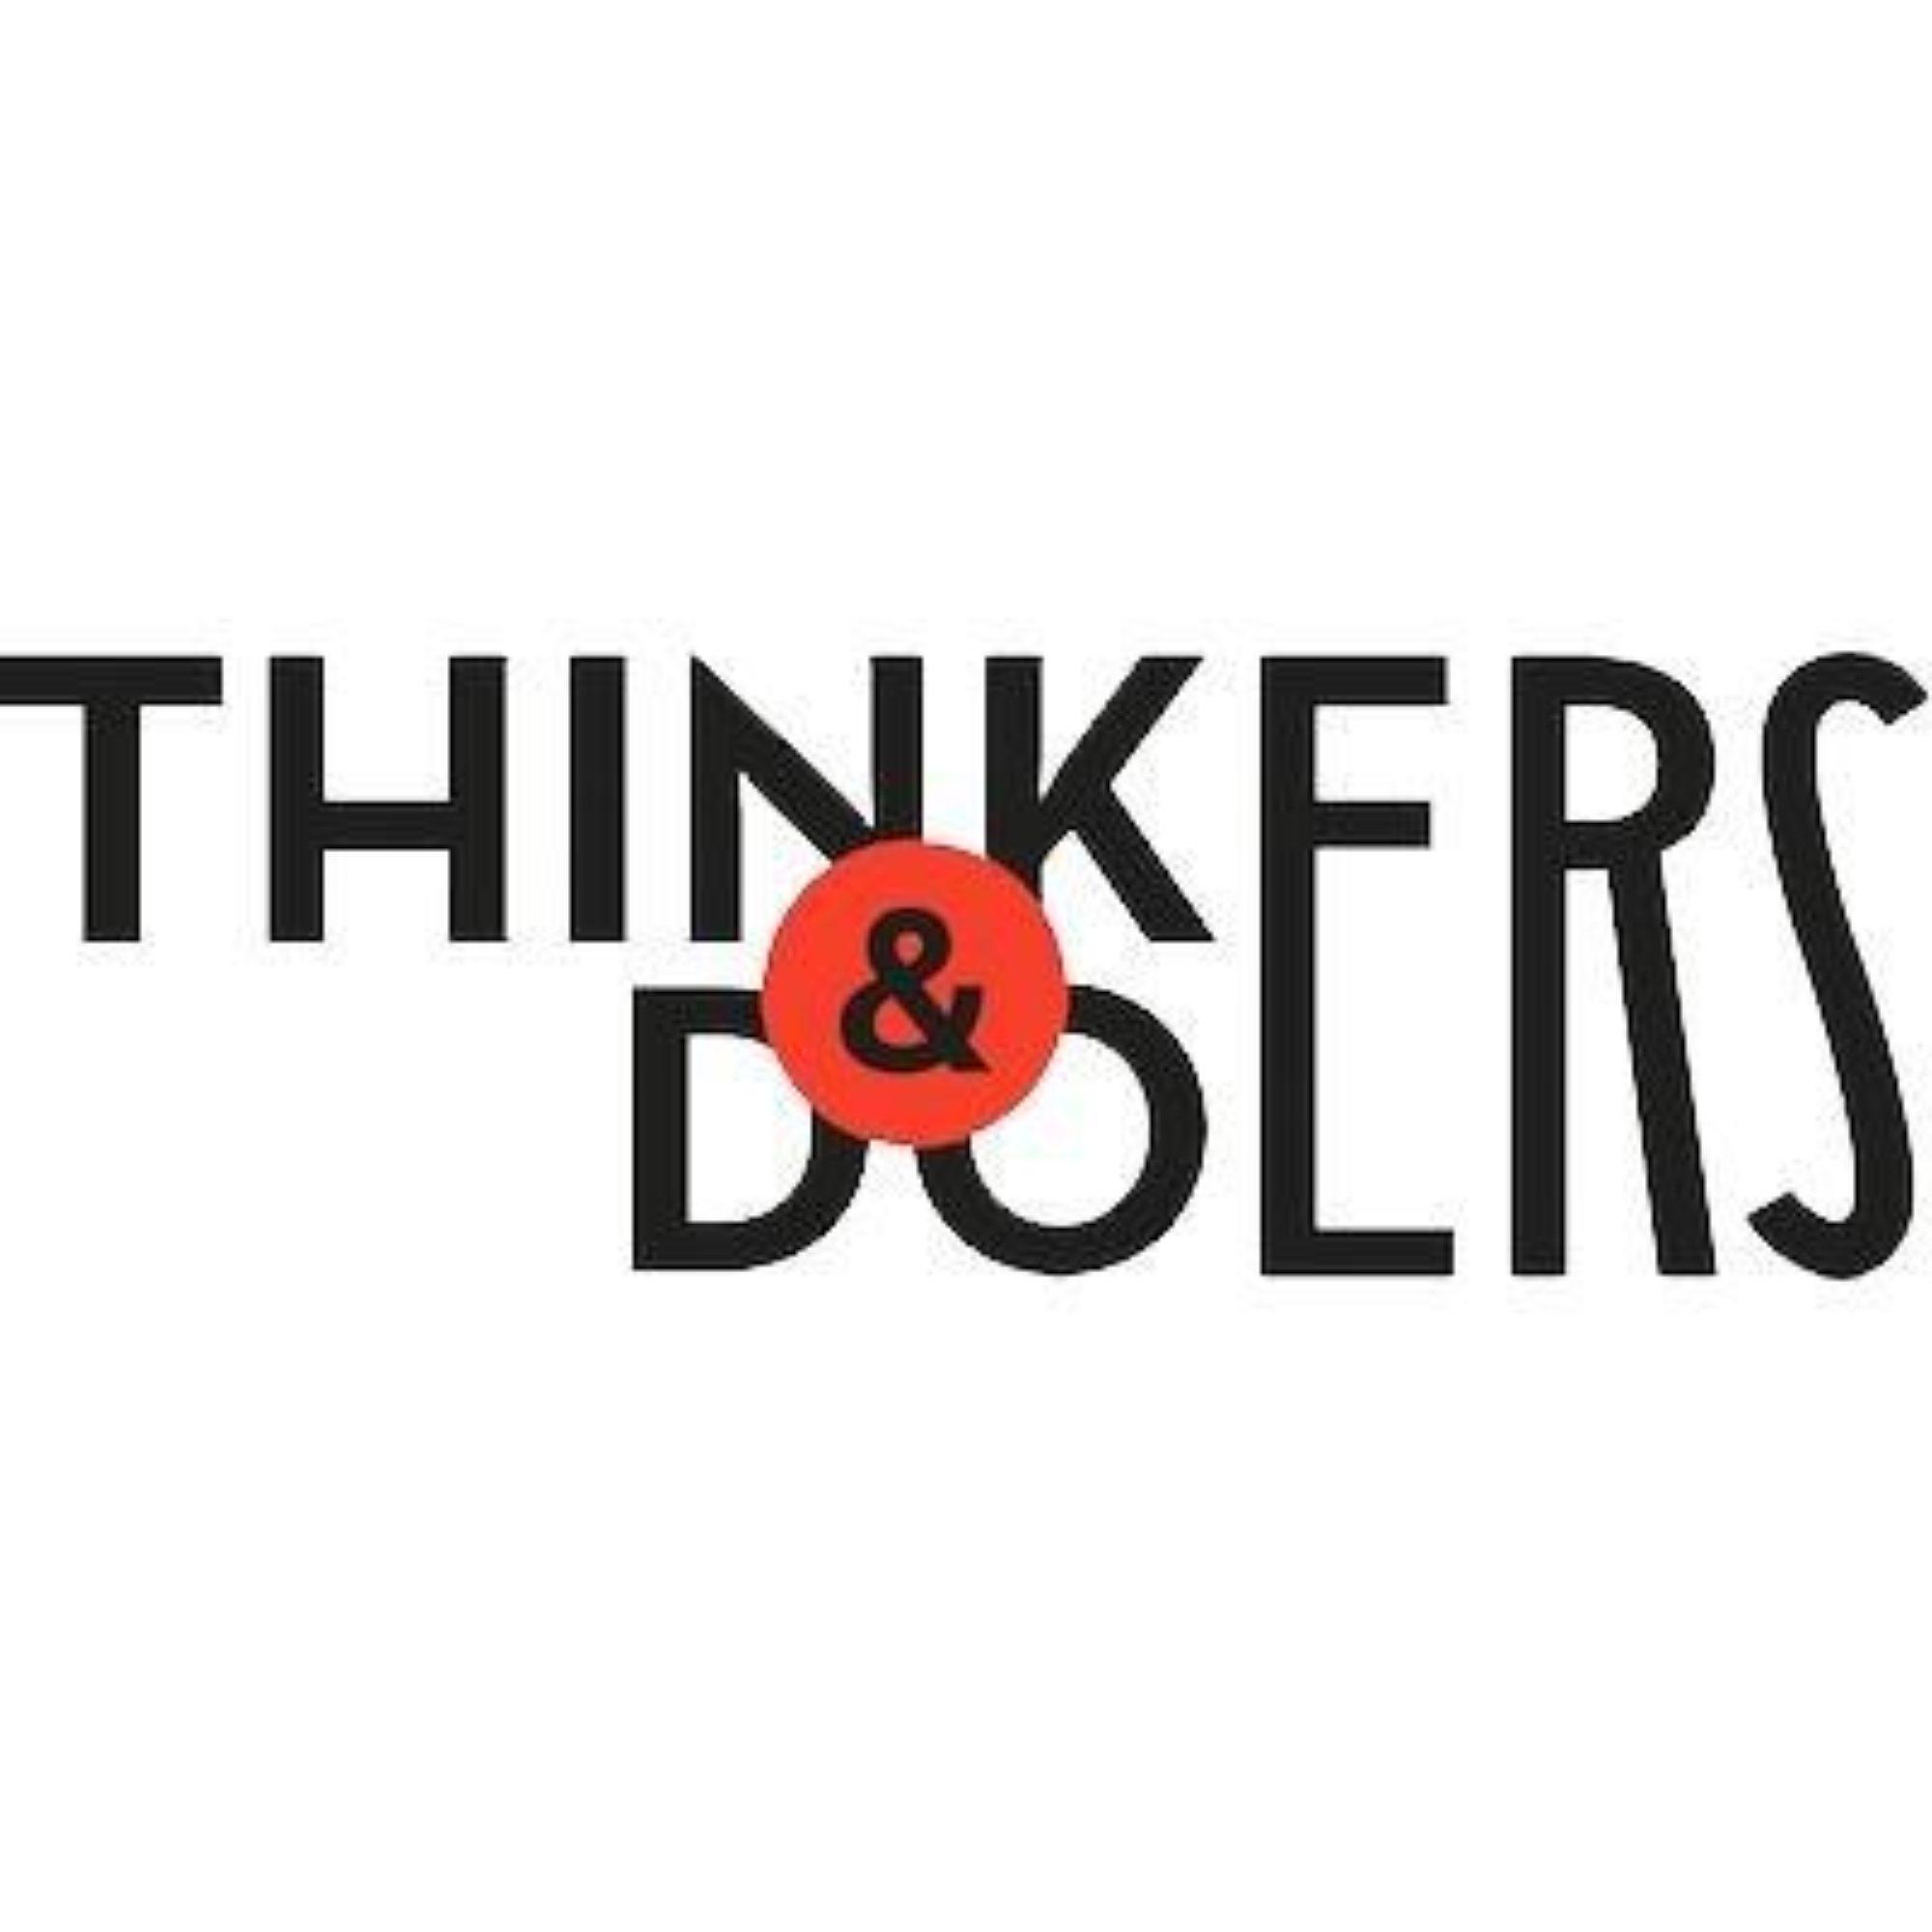 Thinking vs. Doing